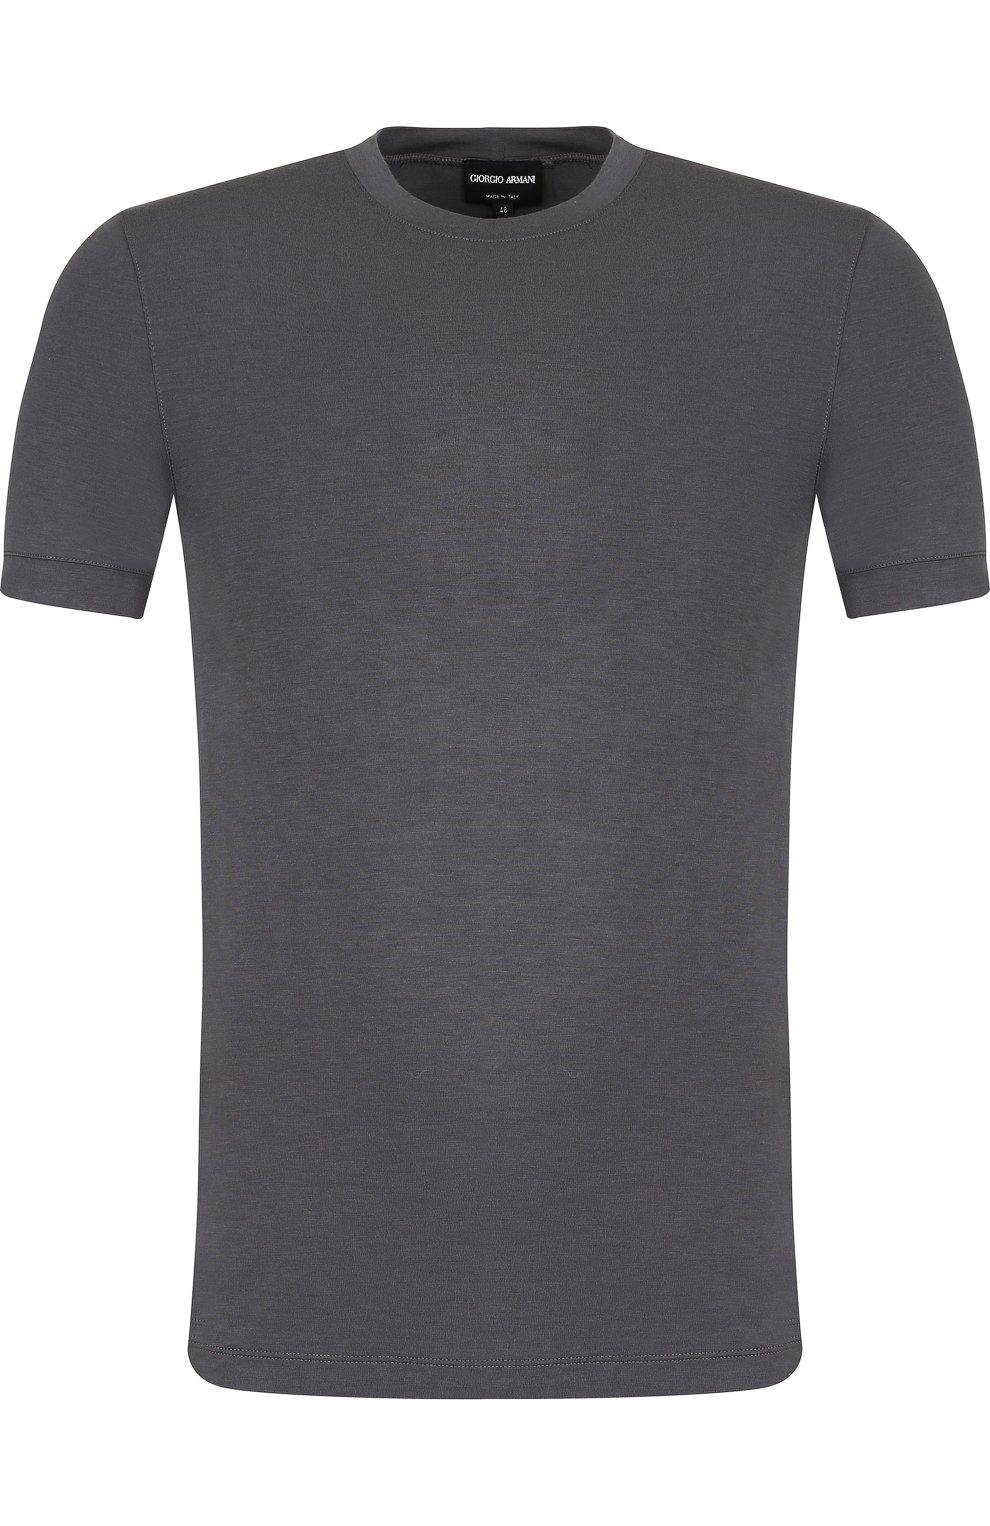 Мужская однотонная футболка из вискозы GIORGIO ARMANI серого цвета, арт. 8NST52/SJP4Z | Фото 1